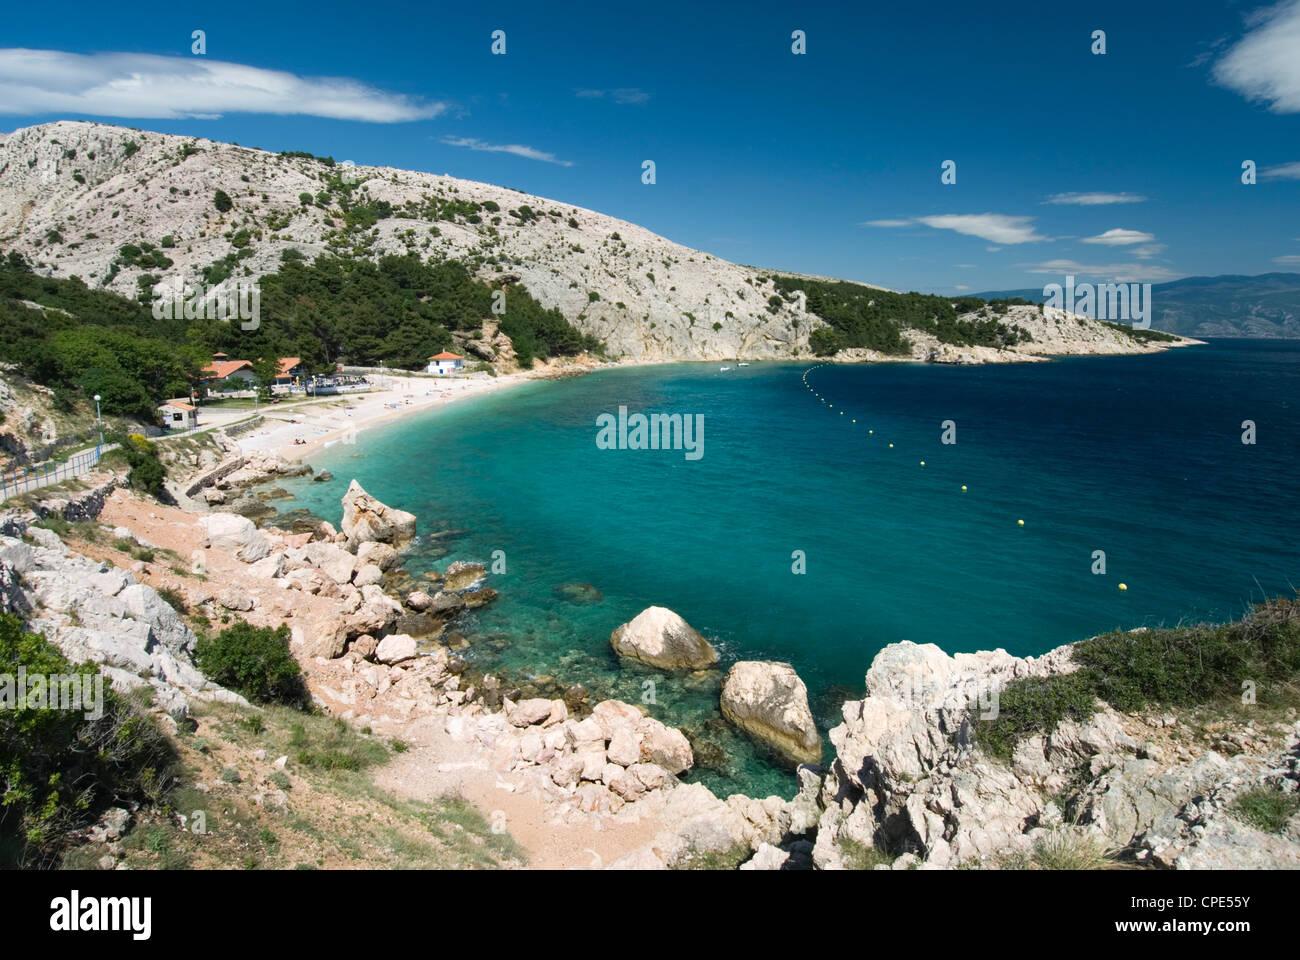 Secluded beach, Baska, Krk Island, Kvarner Gulf, Croatia, Adriatic, Europe - Stock Image